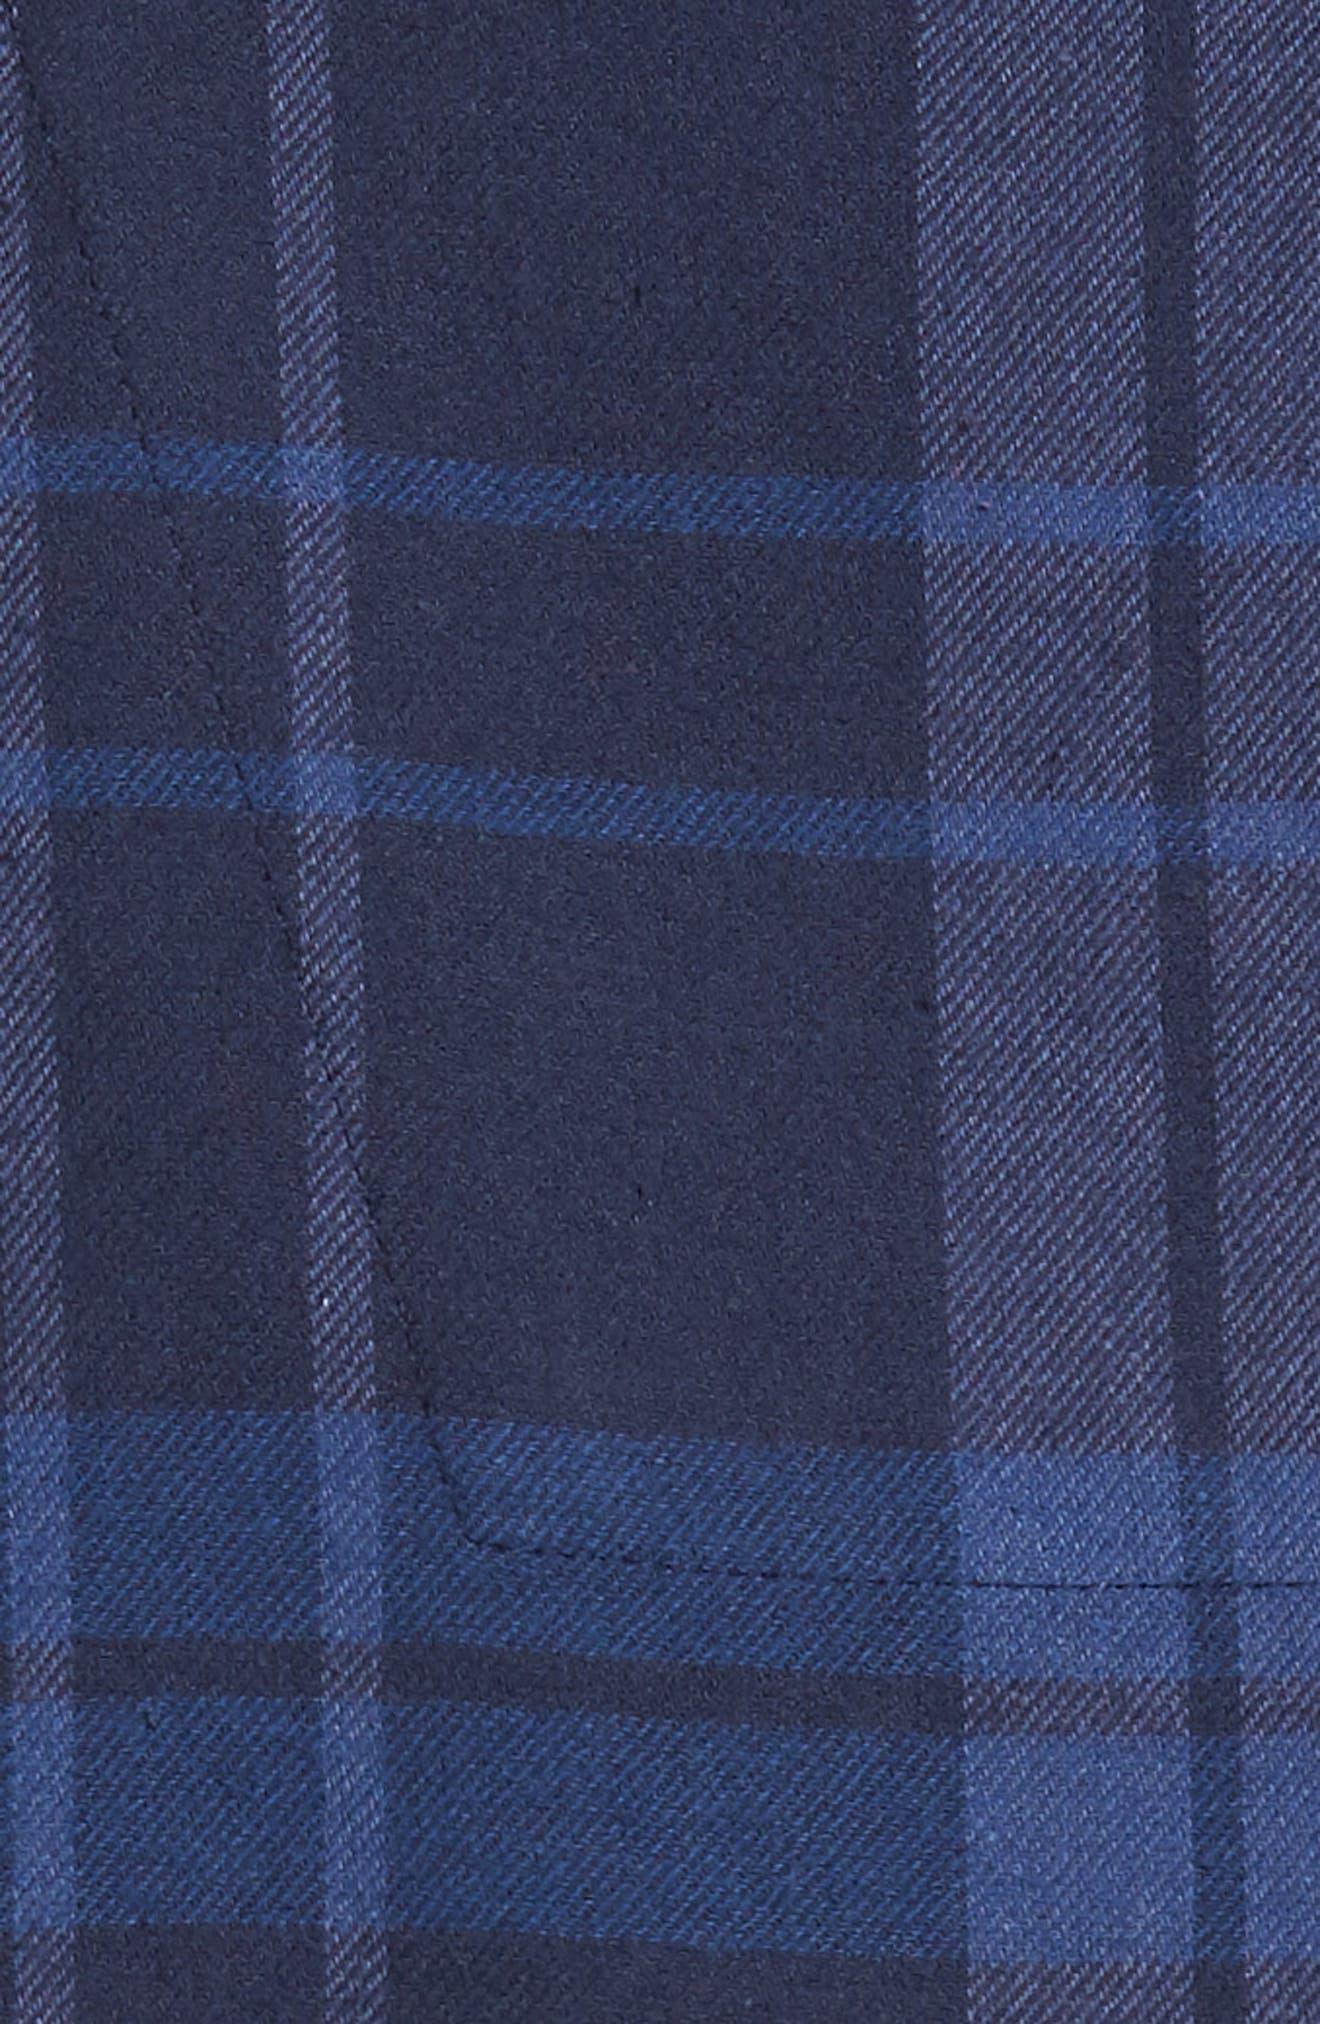 '824' Flannel Pajama Set,                             Alternate thumbnail 104, color,